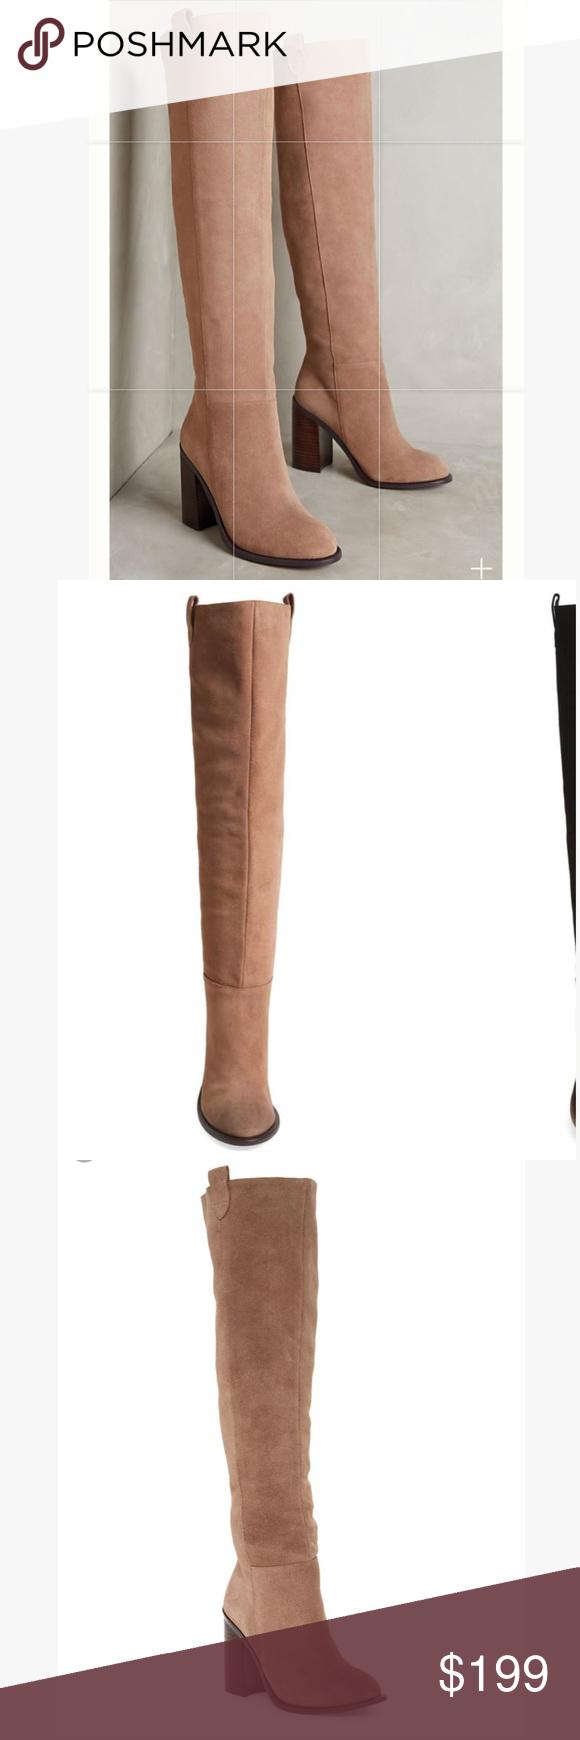 9122bf28de8 Kelsi Dagger Brooklyn Harman Tall Boot Kelsi Dagger Brooklyn Harman Tall  Boot •size  7.5 •color  latte •tall over the knee boots •3.5